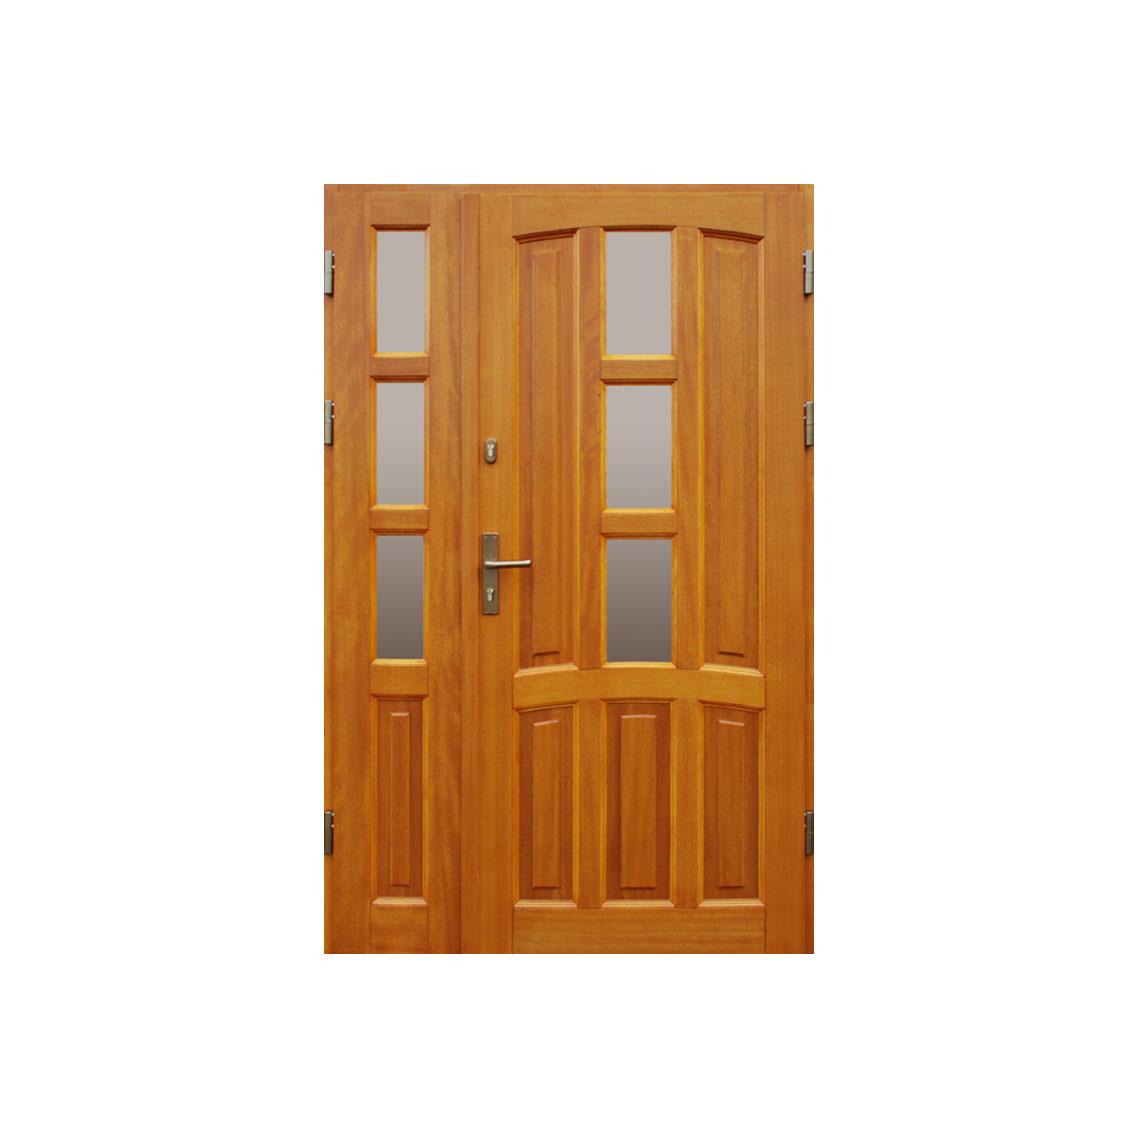 Koka durvis WD-6